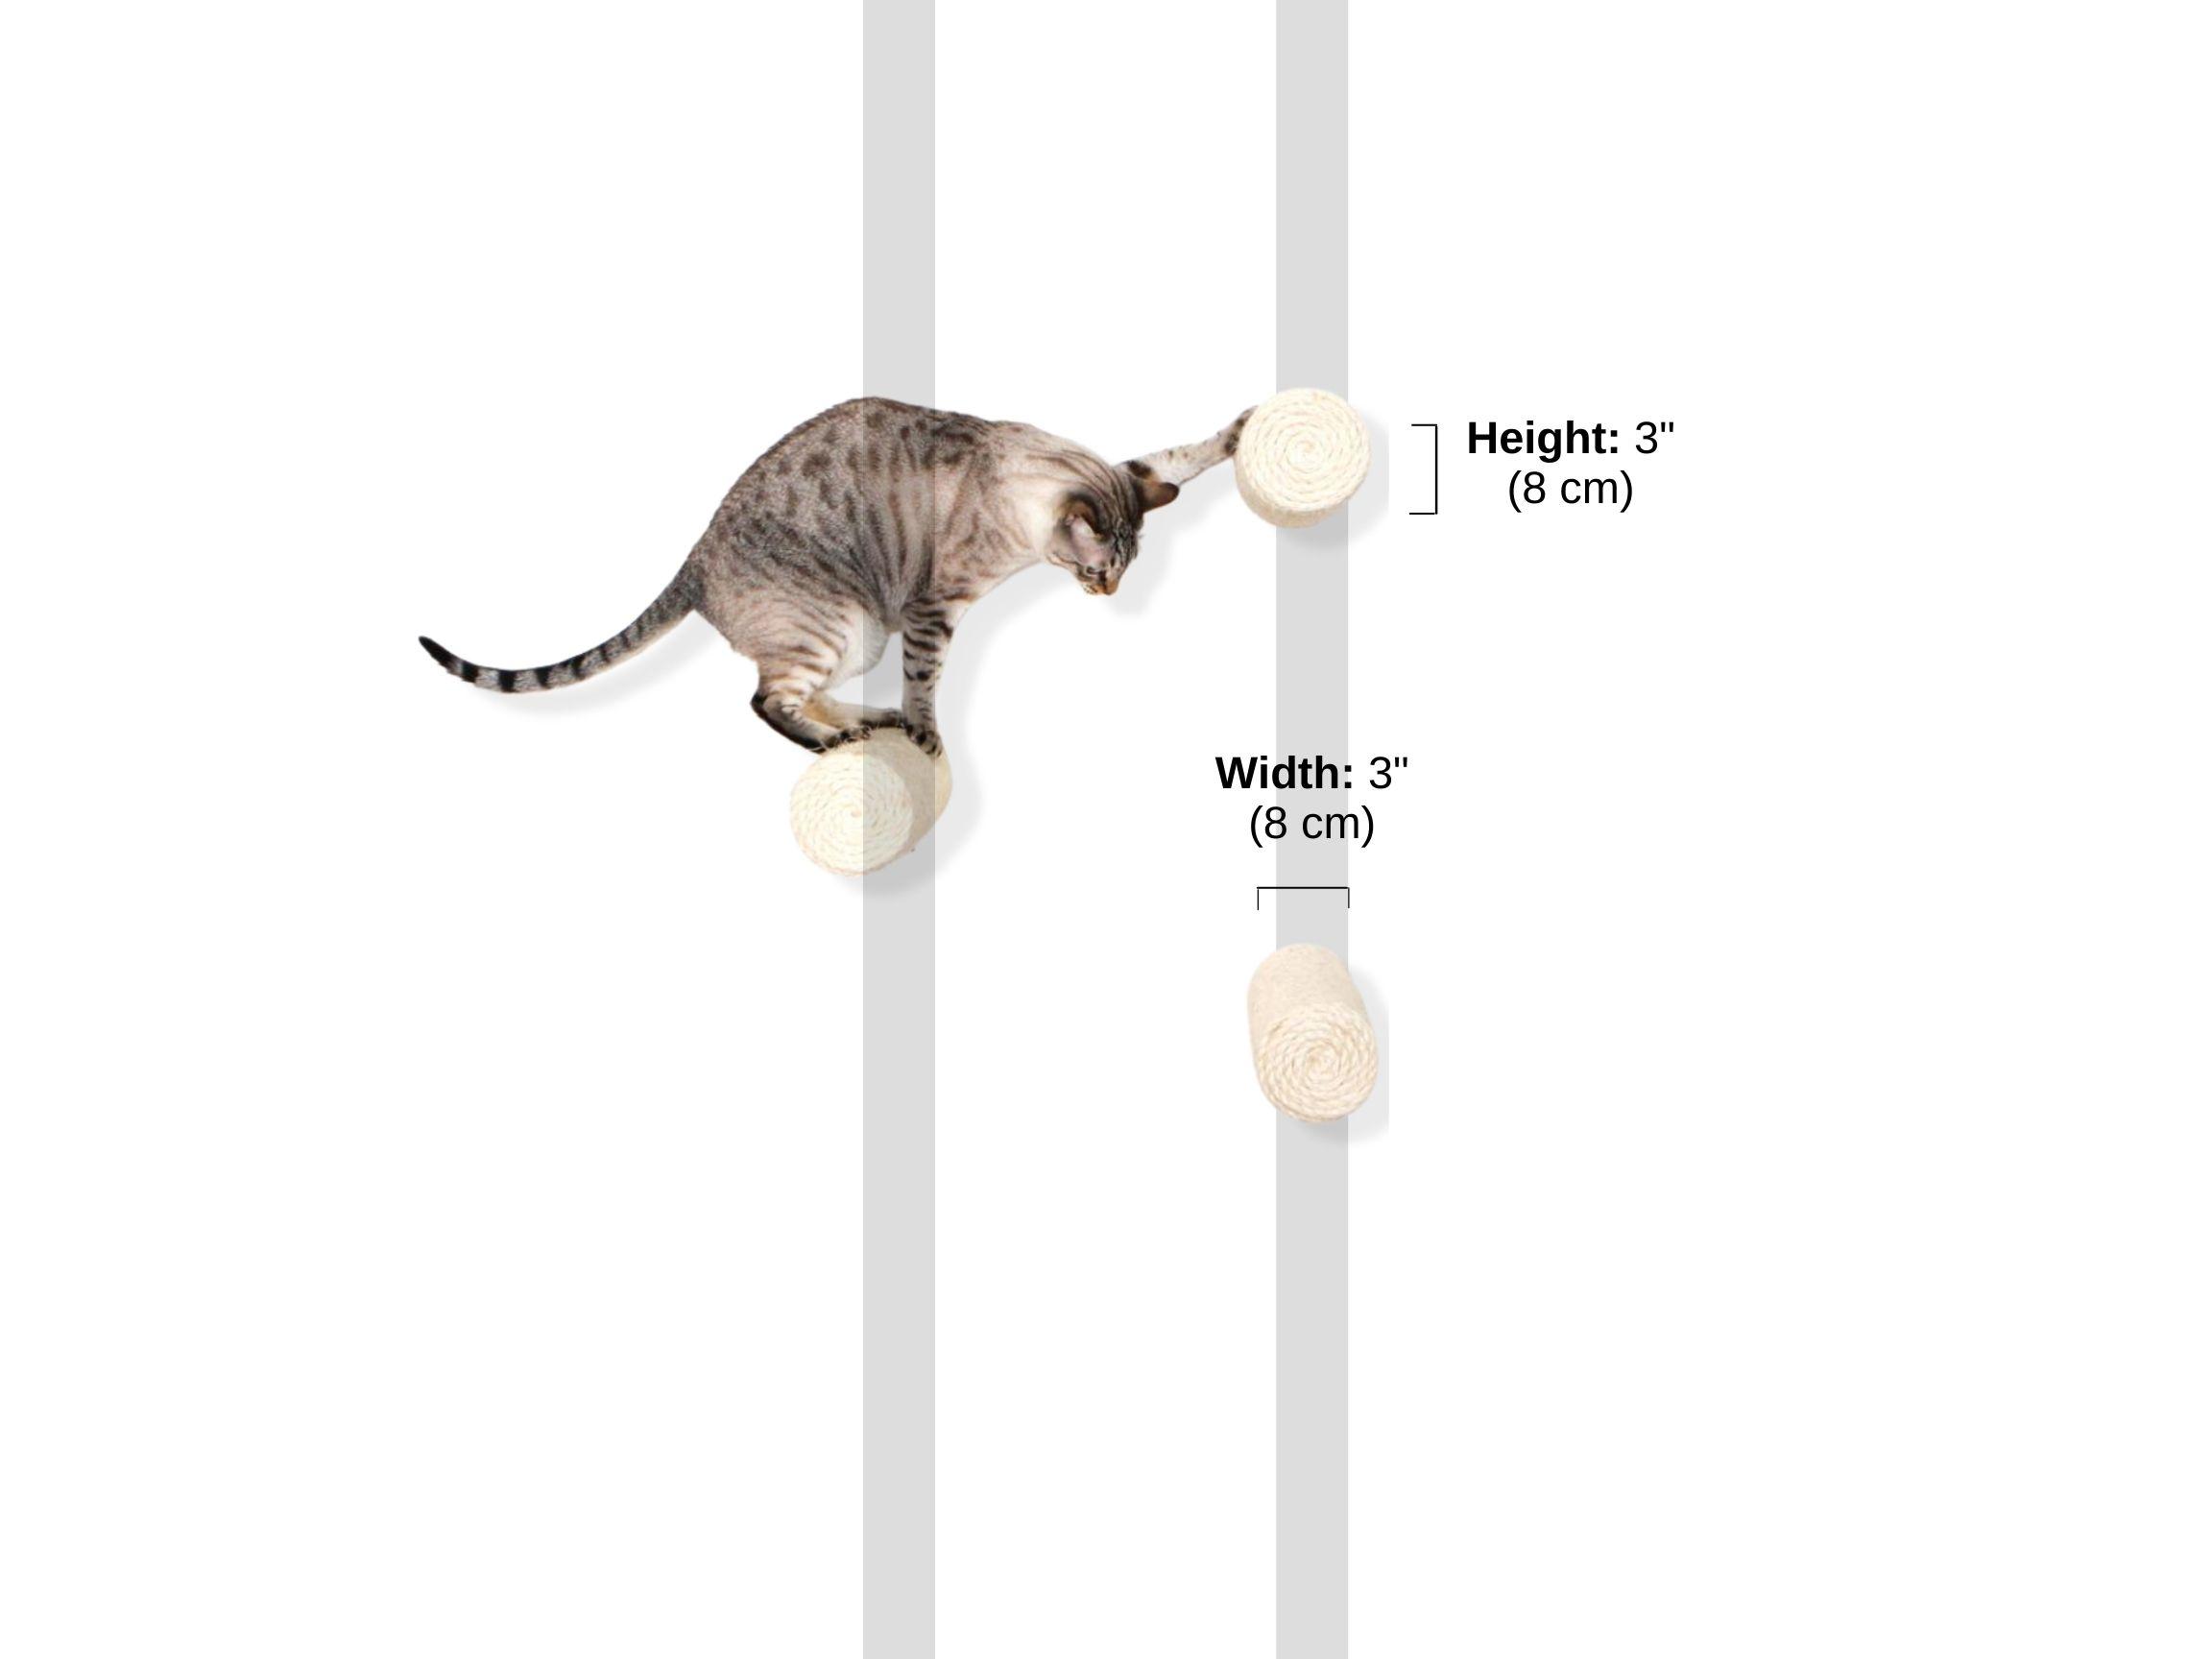 Stud spacing and Dimensions of floating sisal poles